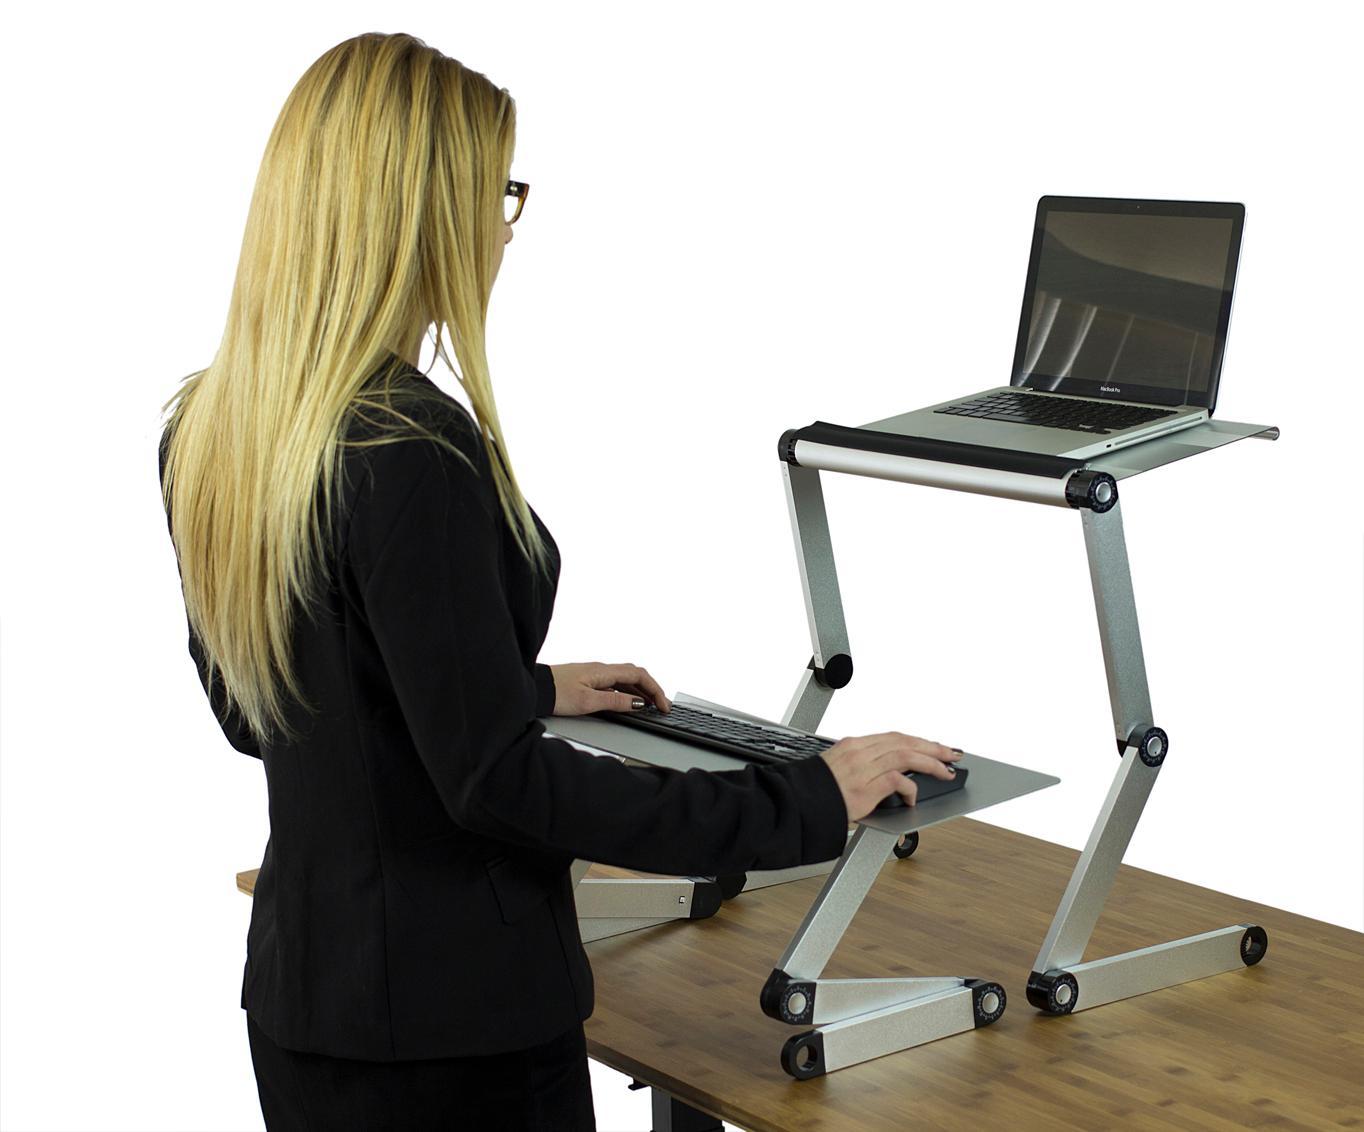 Workez Standing Desk Conversion Kit With 2 Fans Amp 3 Usb